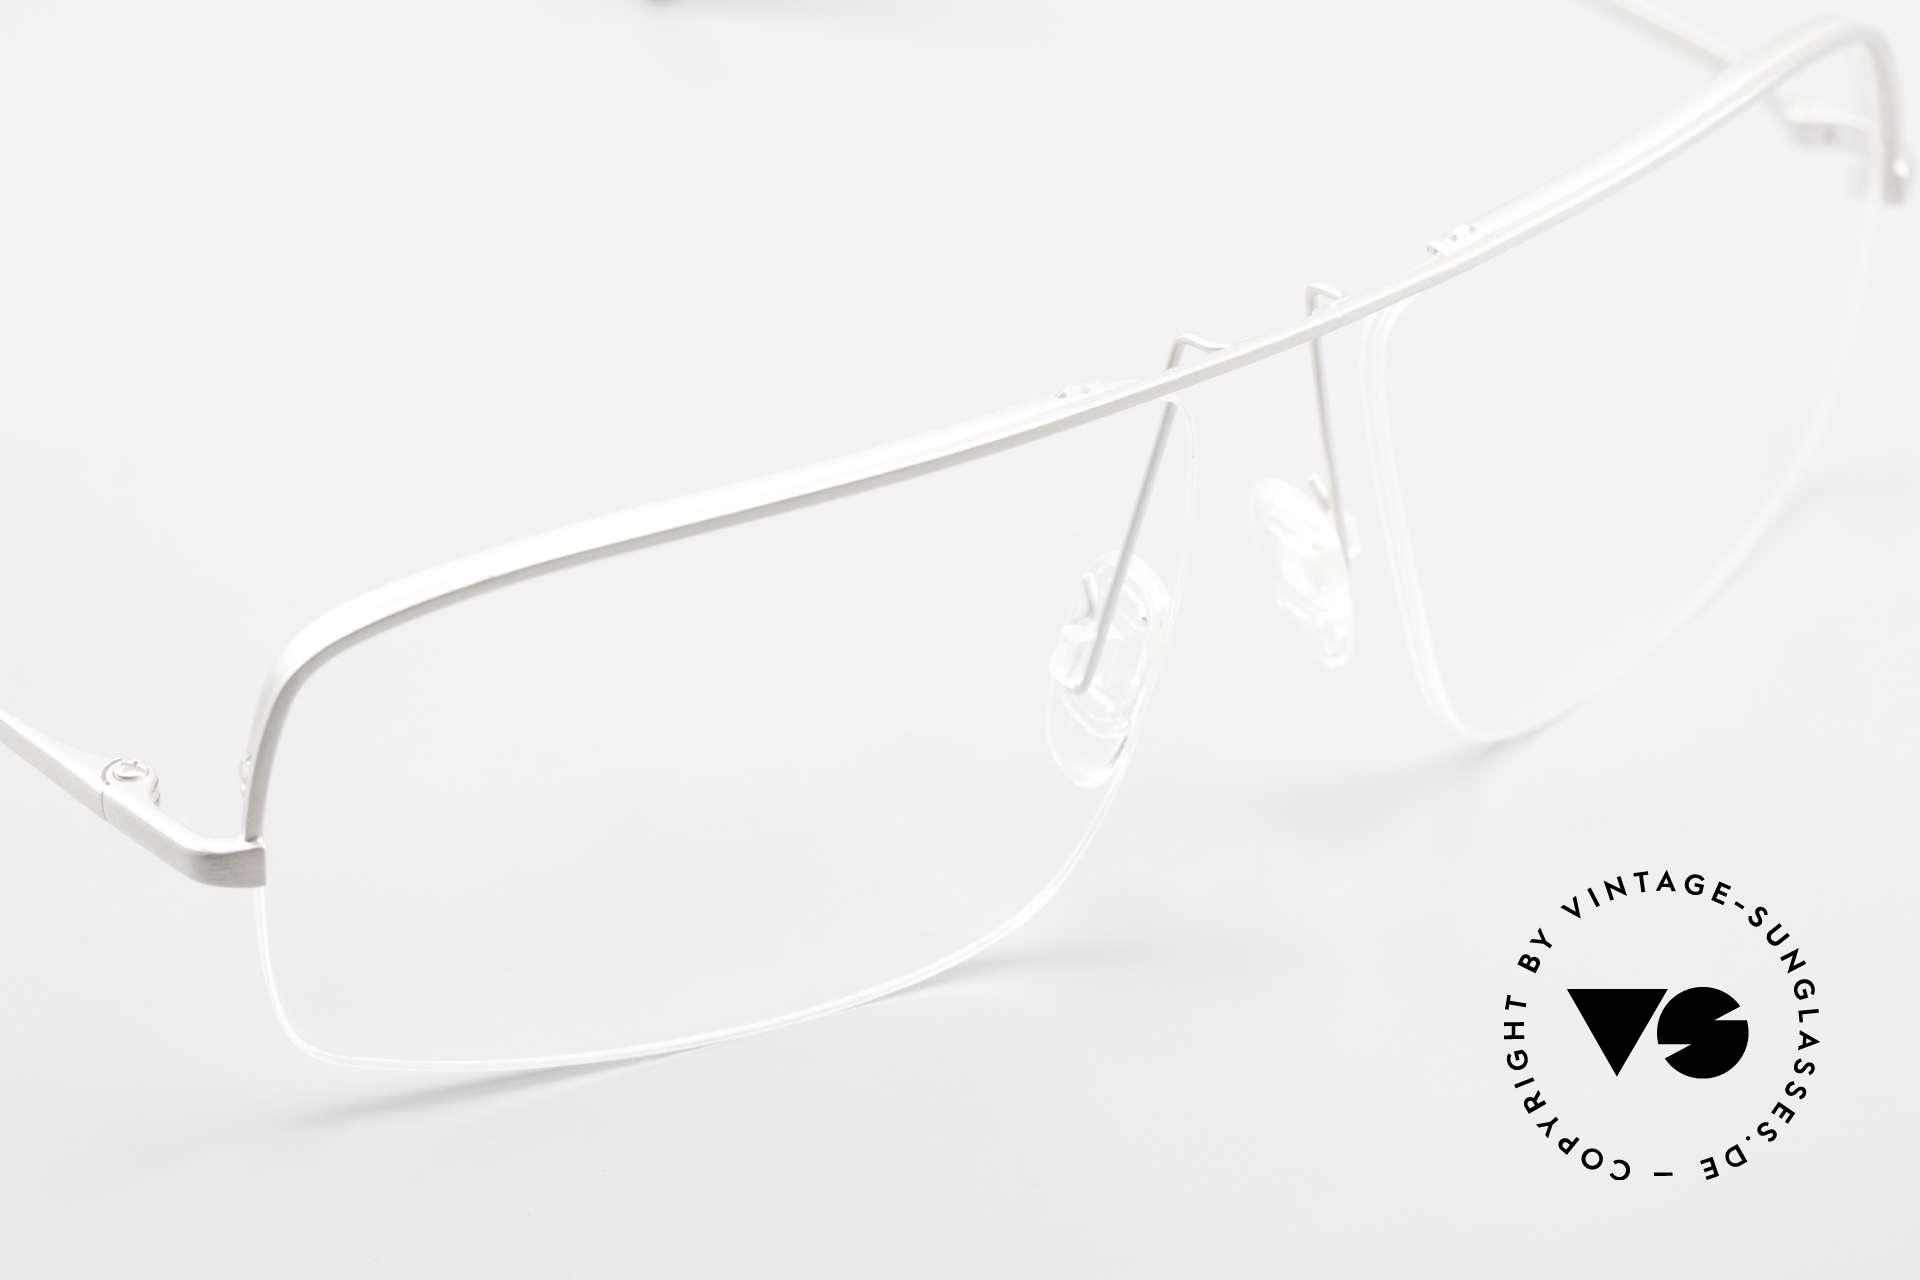 Wolfgang Proksch WP0103 New Tear Drop Titanium Frame, NO RETRO SPECS; but an app. 20 years old rarity, Made for Men